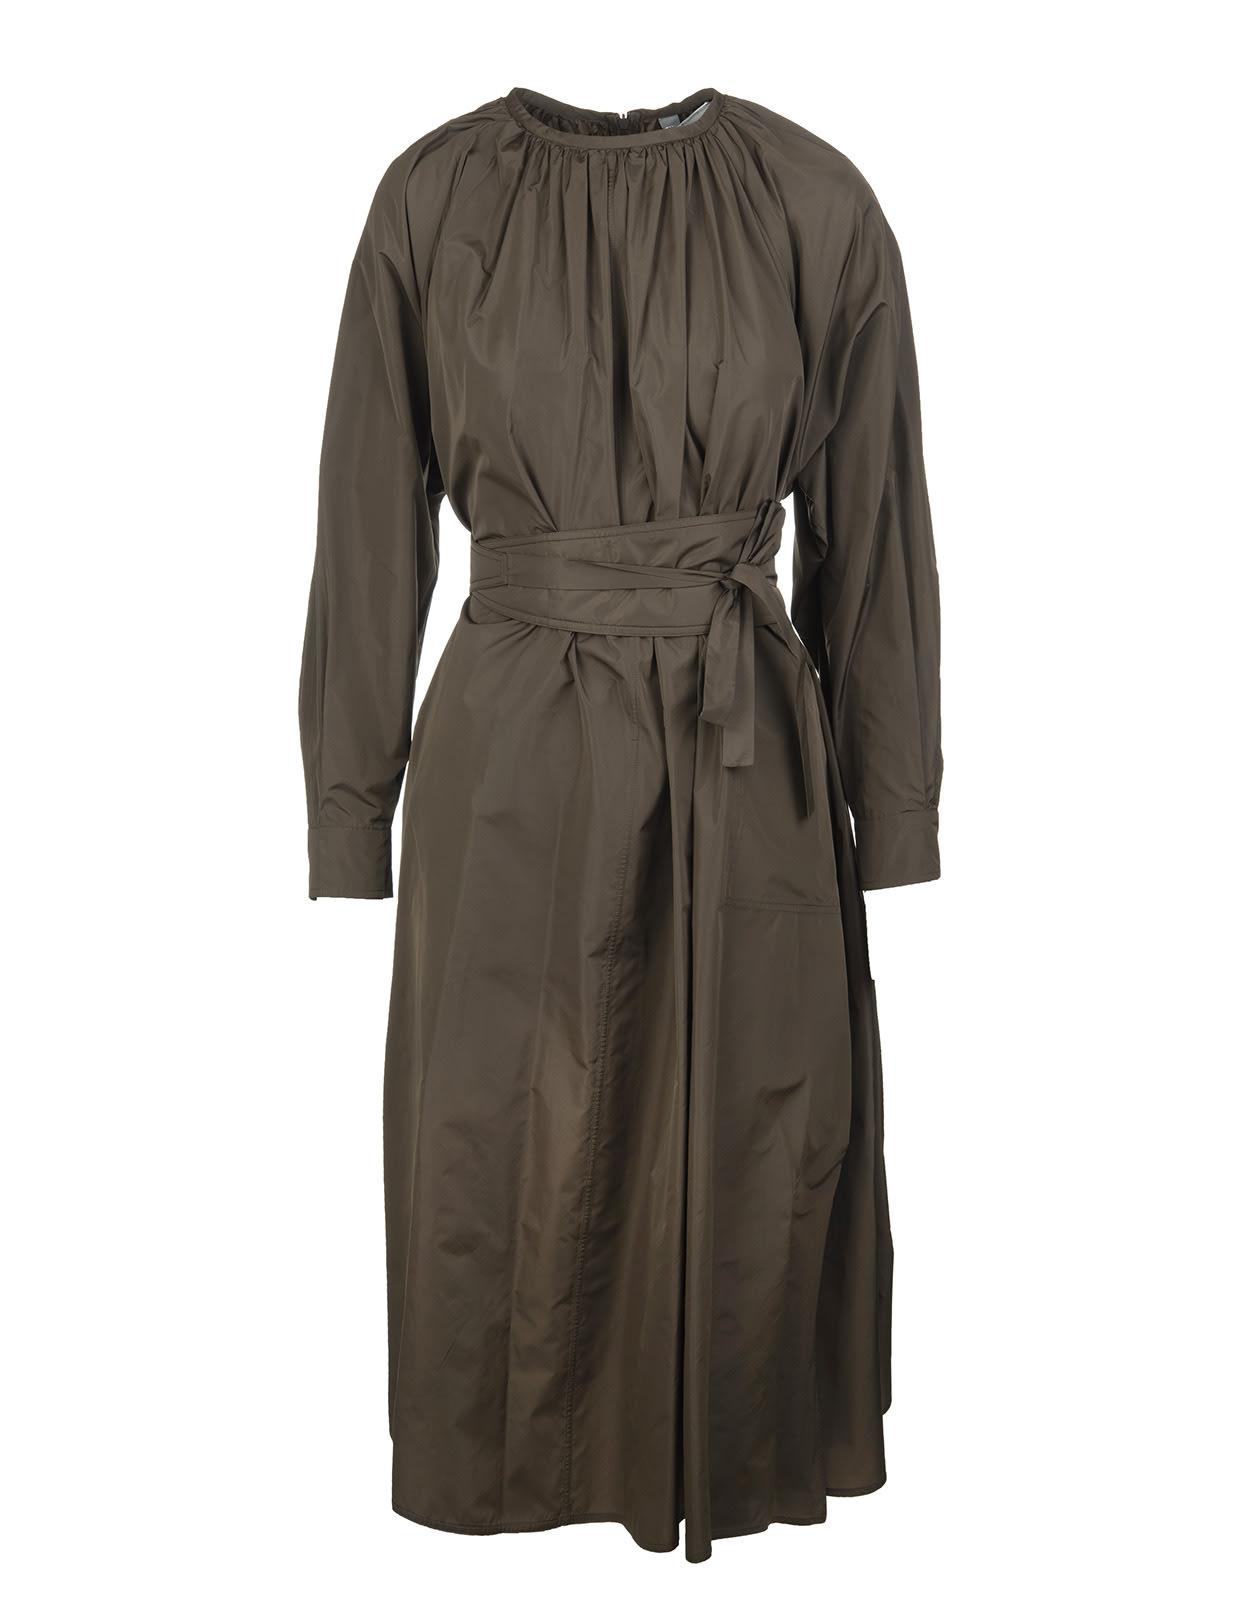 Buy Max Mara Khaki Green Caio Long Dress online, shop Max Mara with free shipping